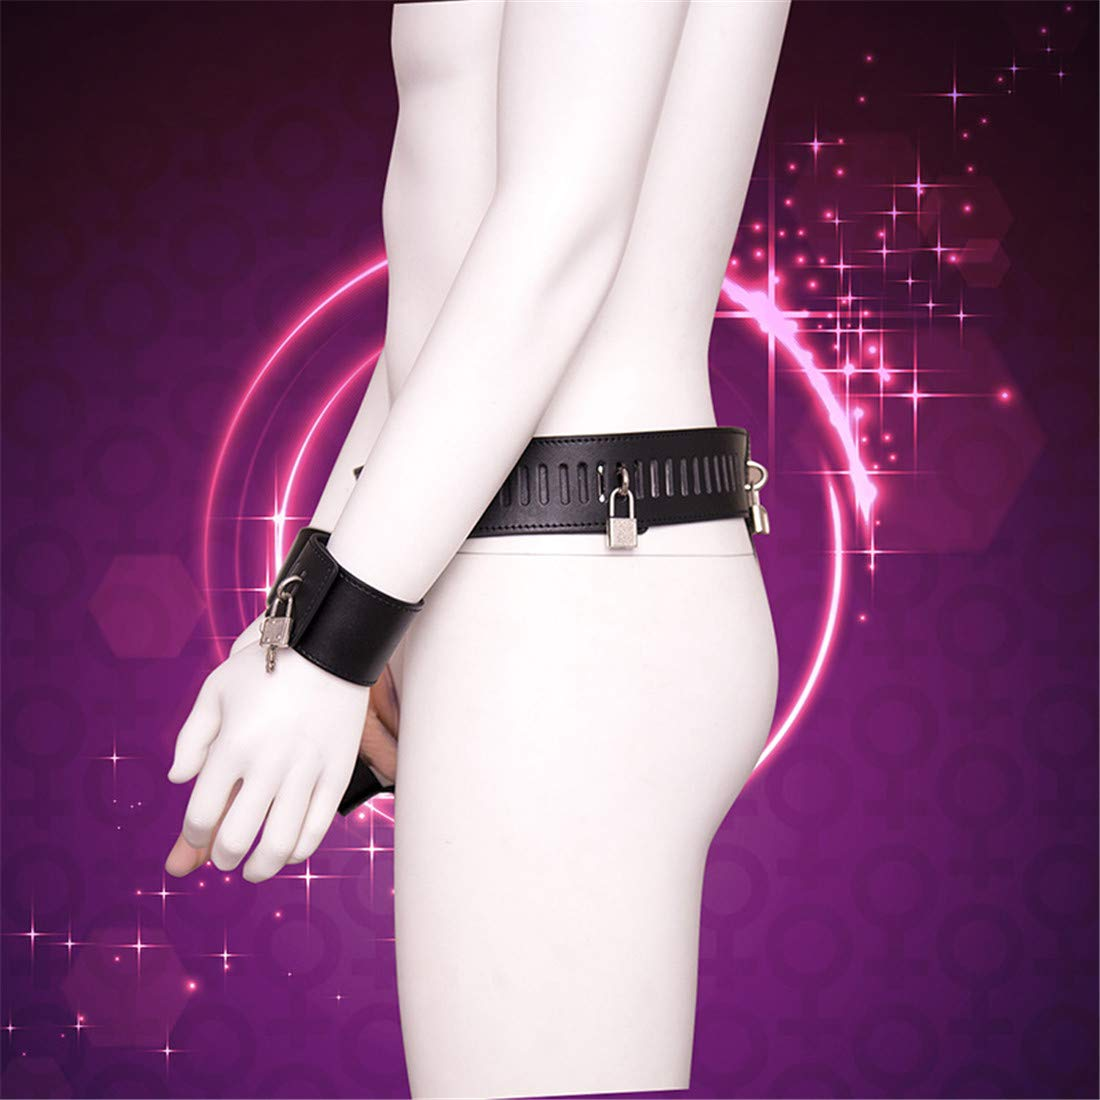 Hemotrade Sexy Chastity Chastity Chastity Pants Bundle Rrestraint Maschio Femmina Manette Flirtare Pantaloncini ef18ea